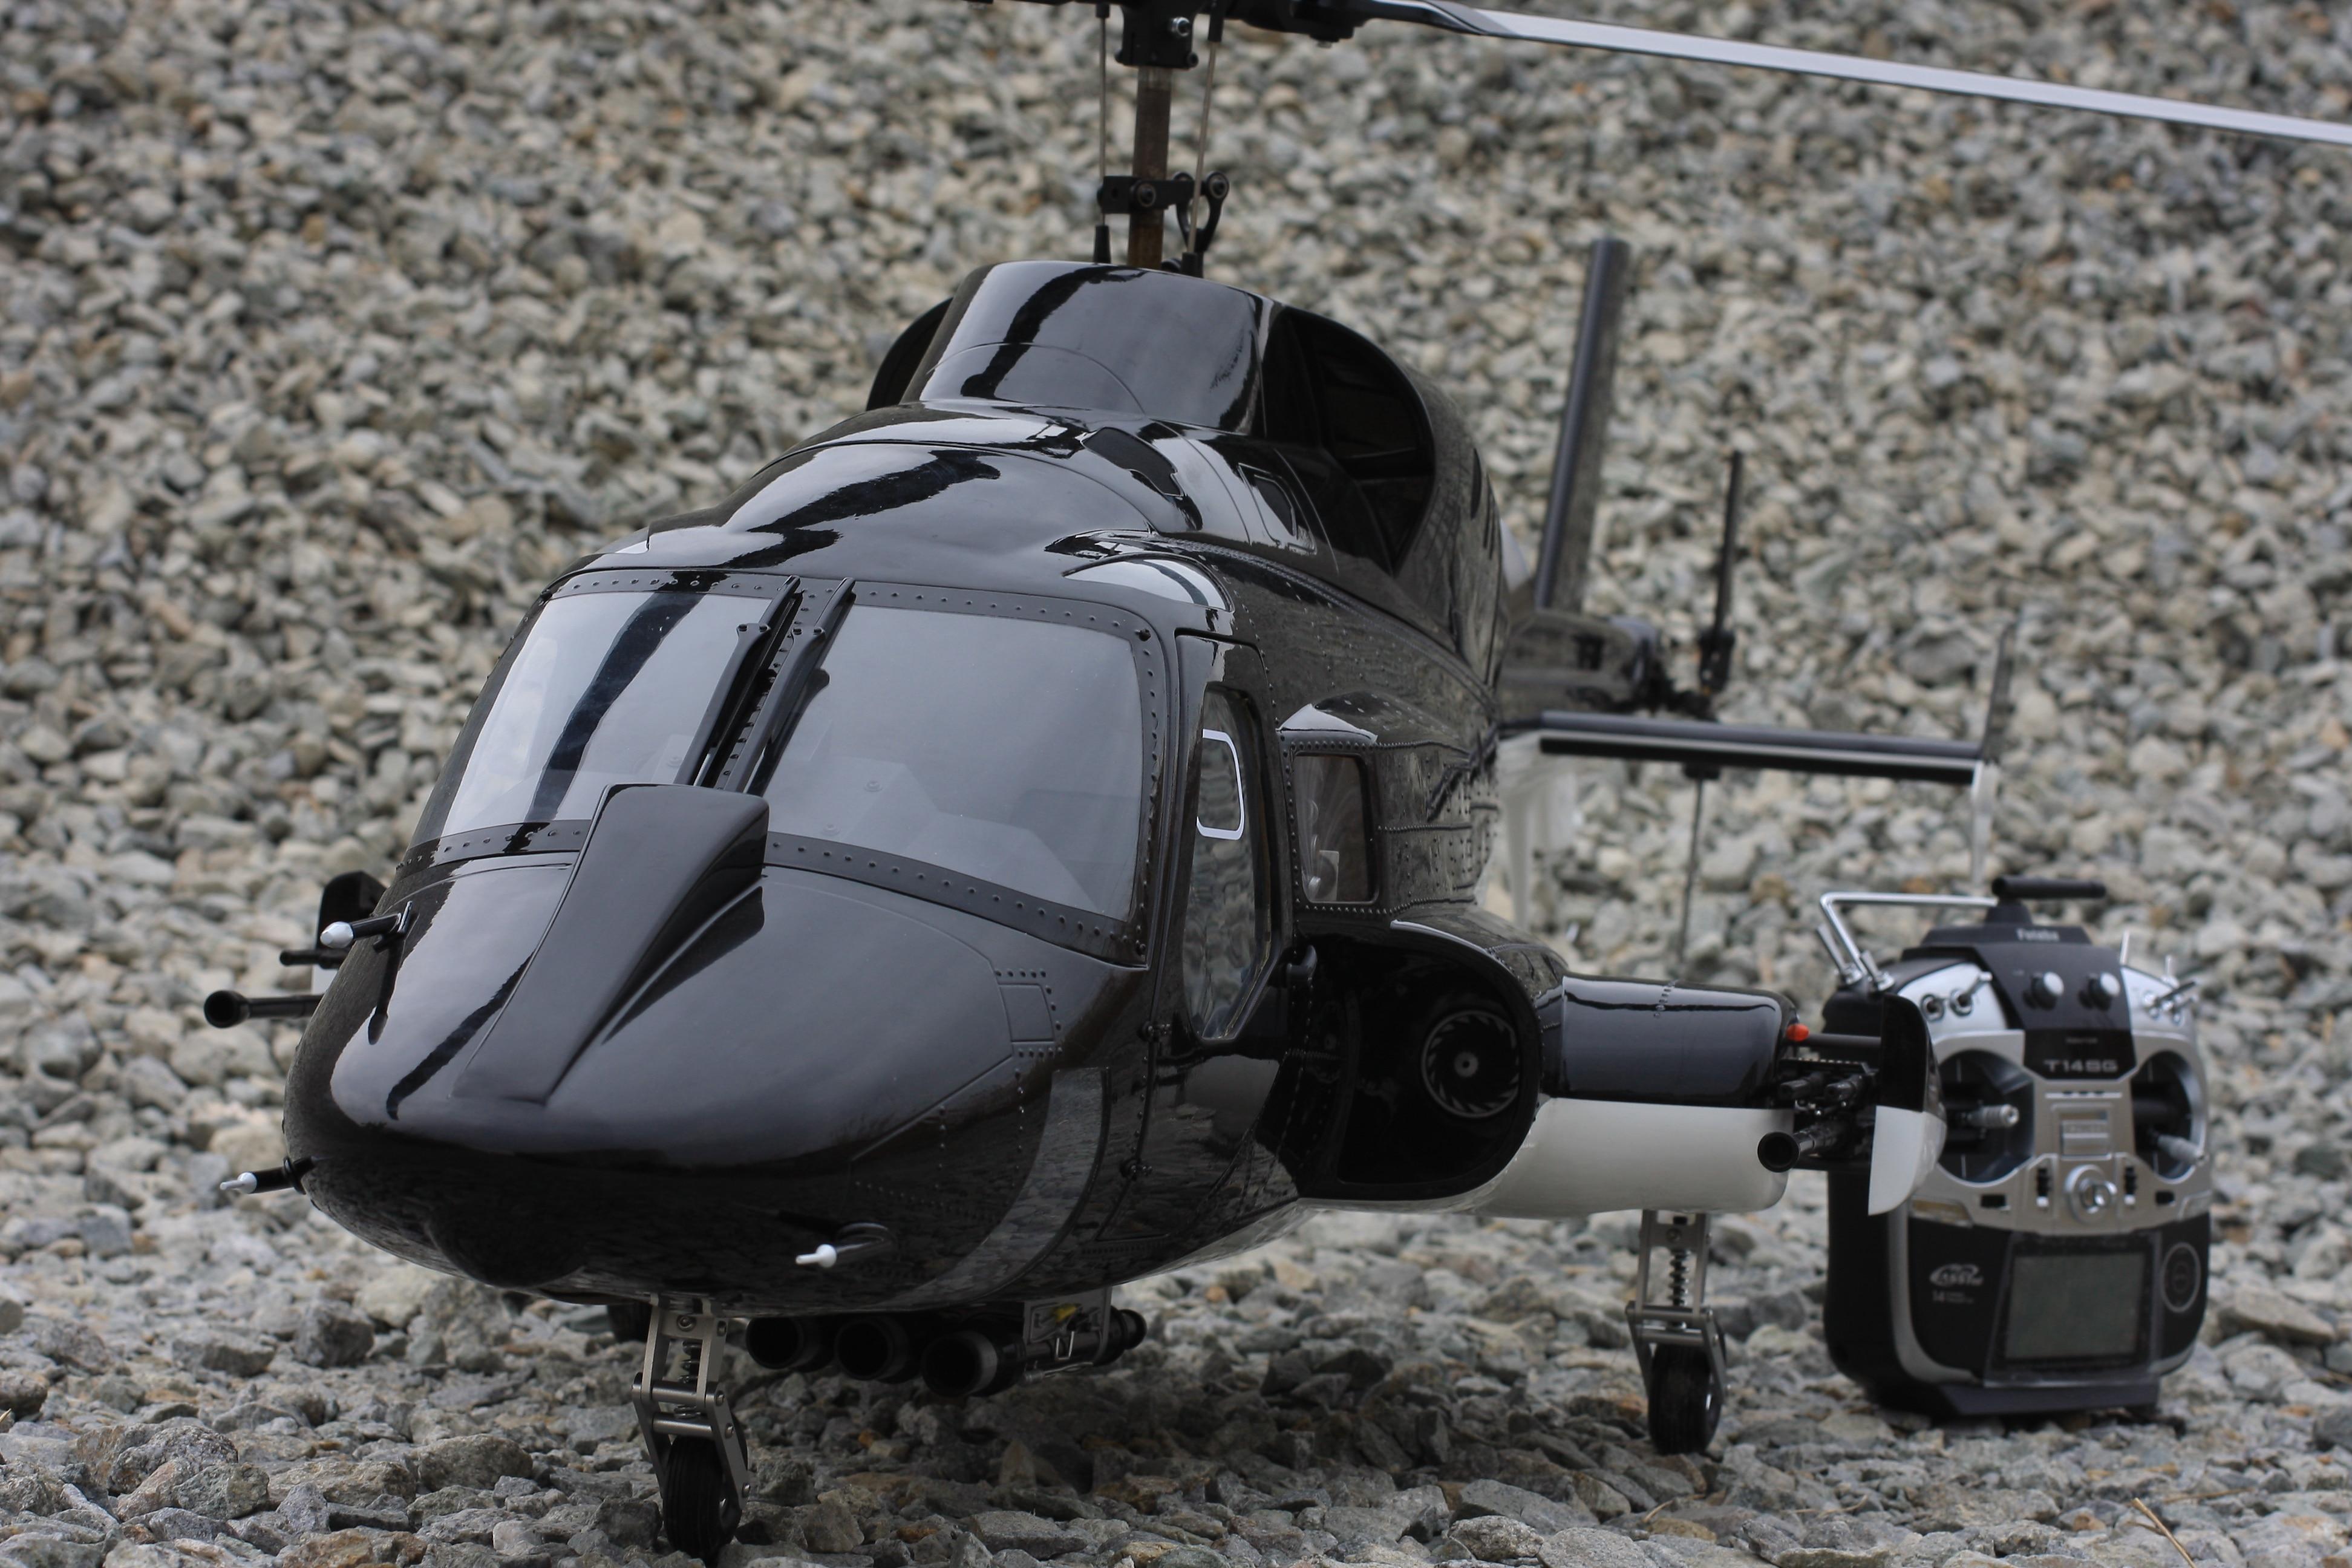 Advance sale 800 size Airwolf Black fuselage Helicopter & Mechanik conversion kit